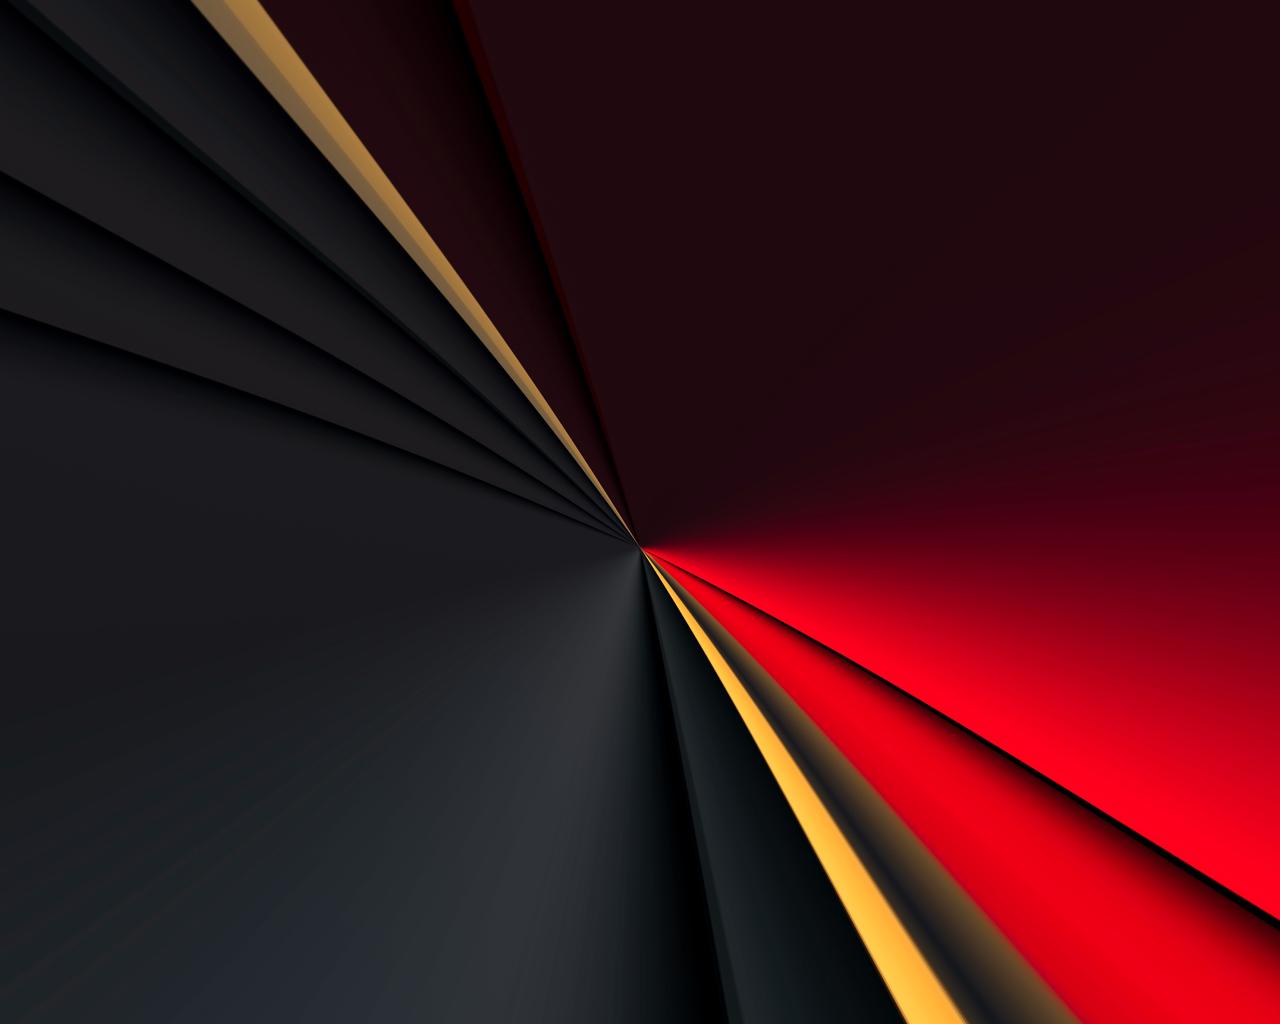 abstract-dark-colors-pattern-8k-dw.jpg